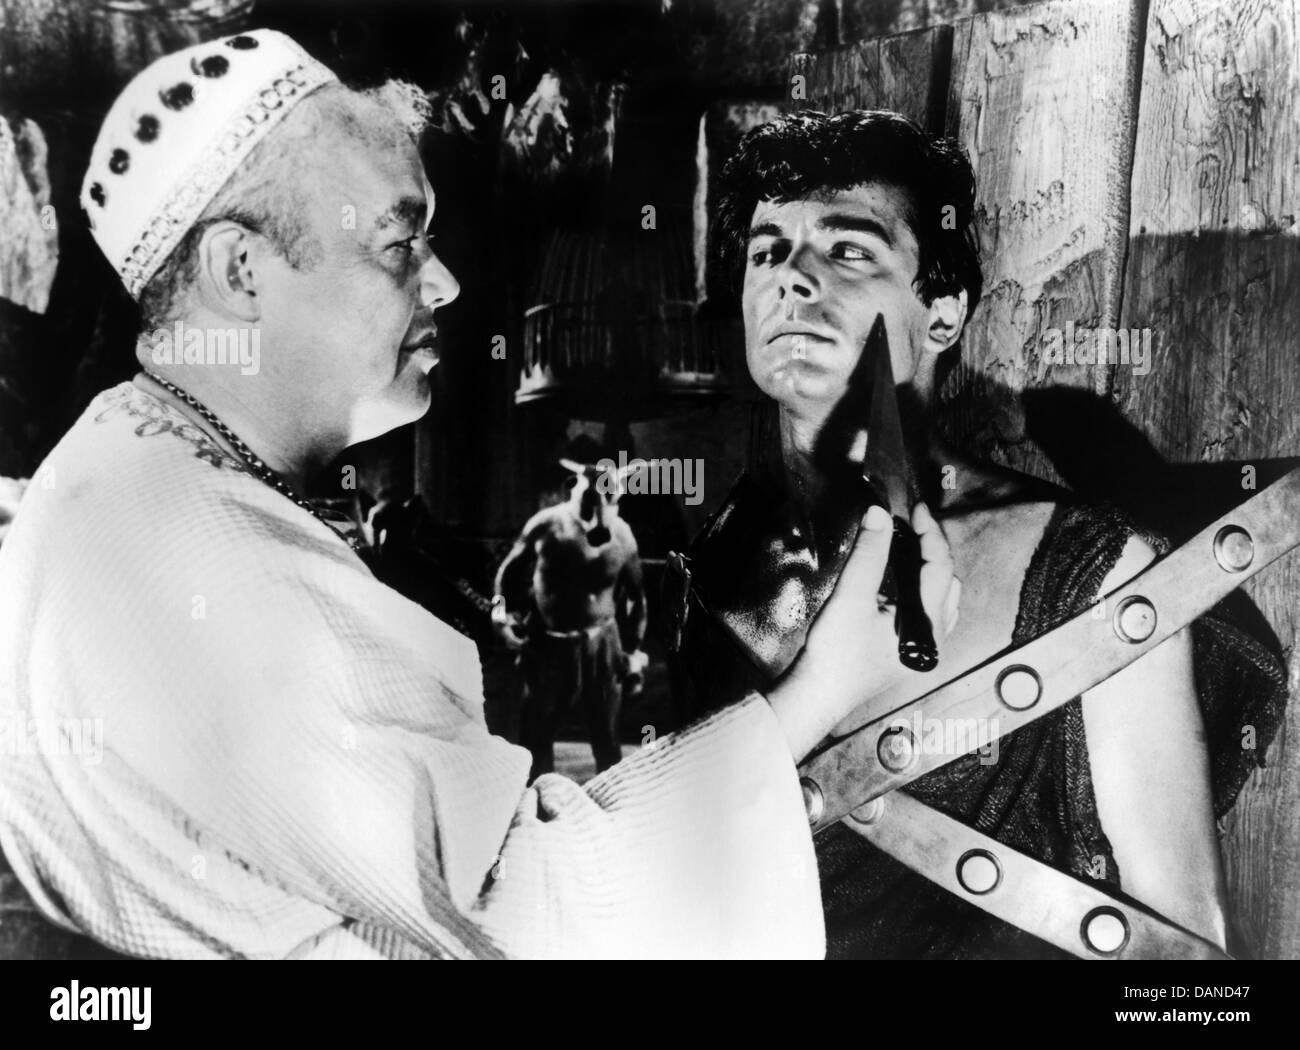 ATLANTIS, DER VERLORENE KONTINENT (1961), EDGAR STEHLI, ANTHONY HALL, GEORGE PAL (DIR) ALCO 003 MOVIESTORE SAMMLUNG Stockbild